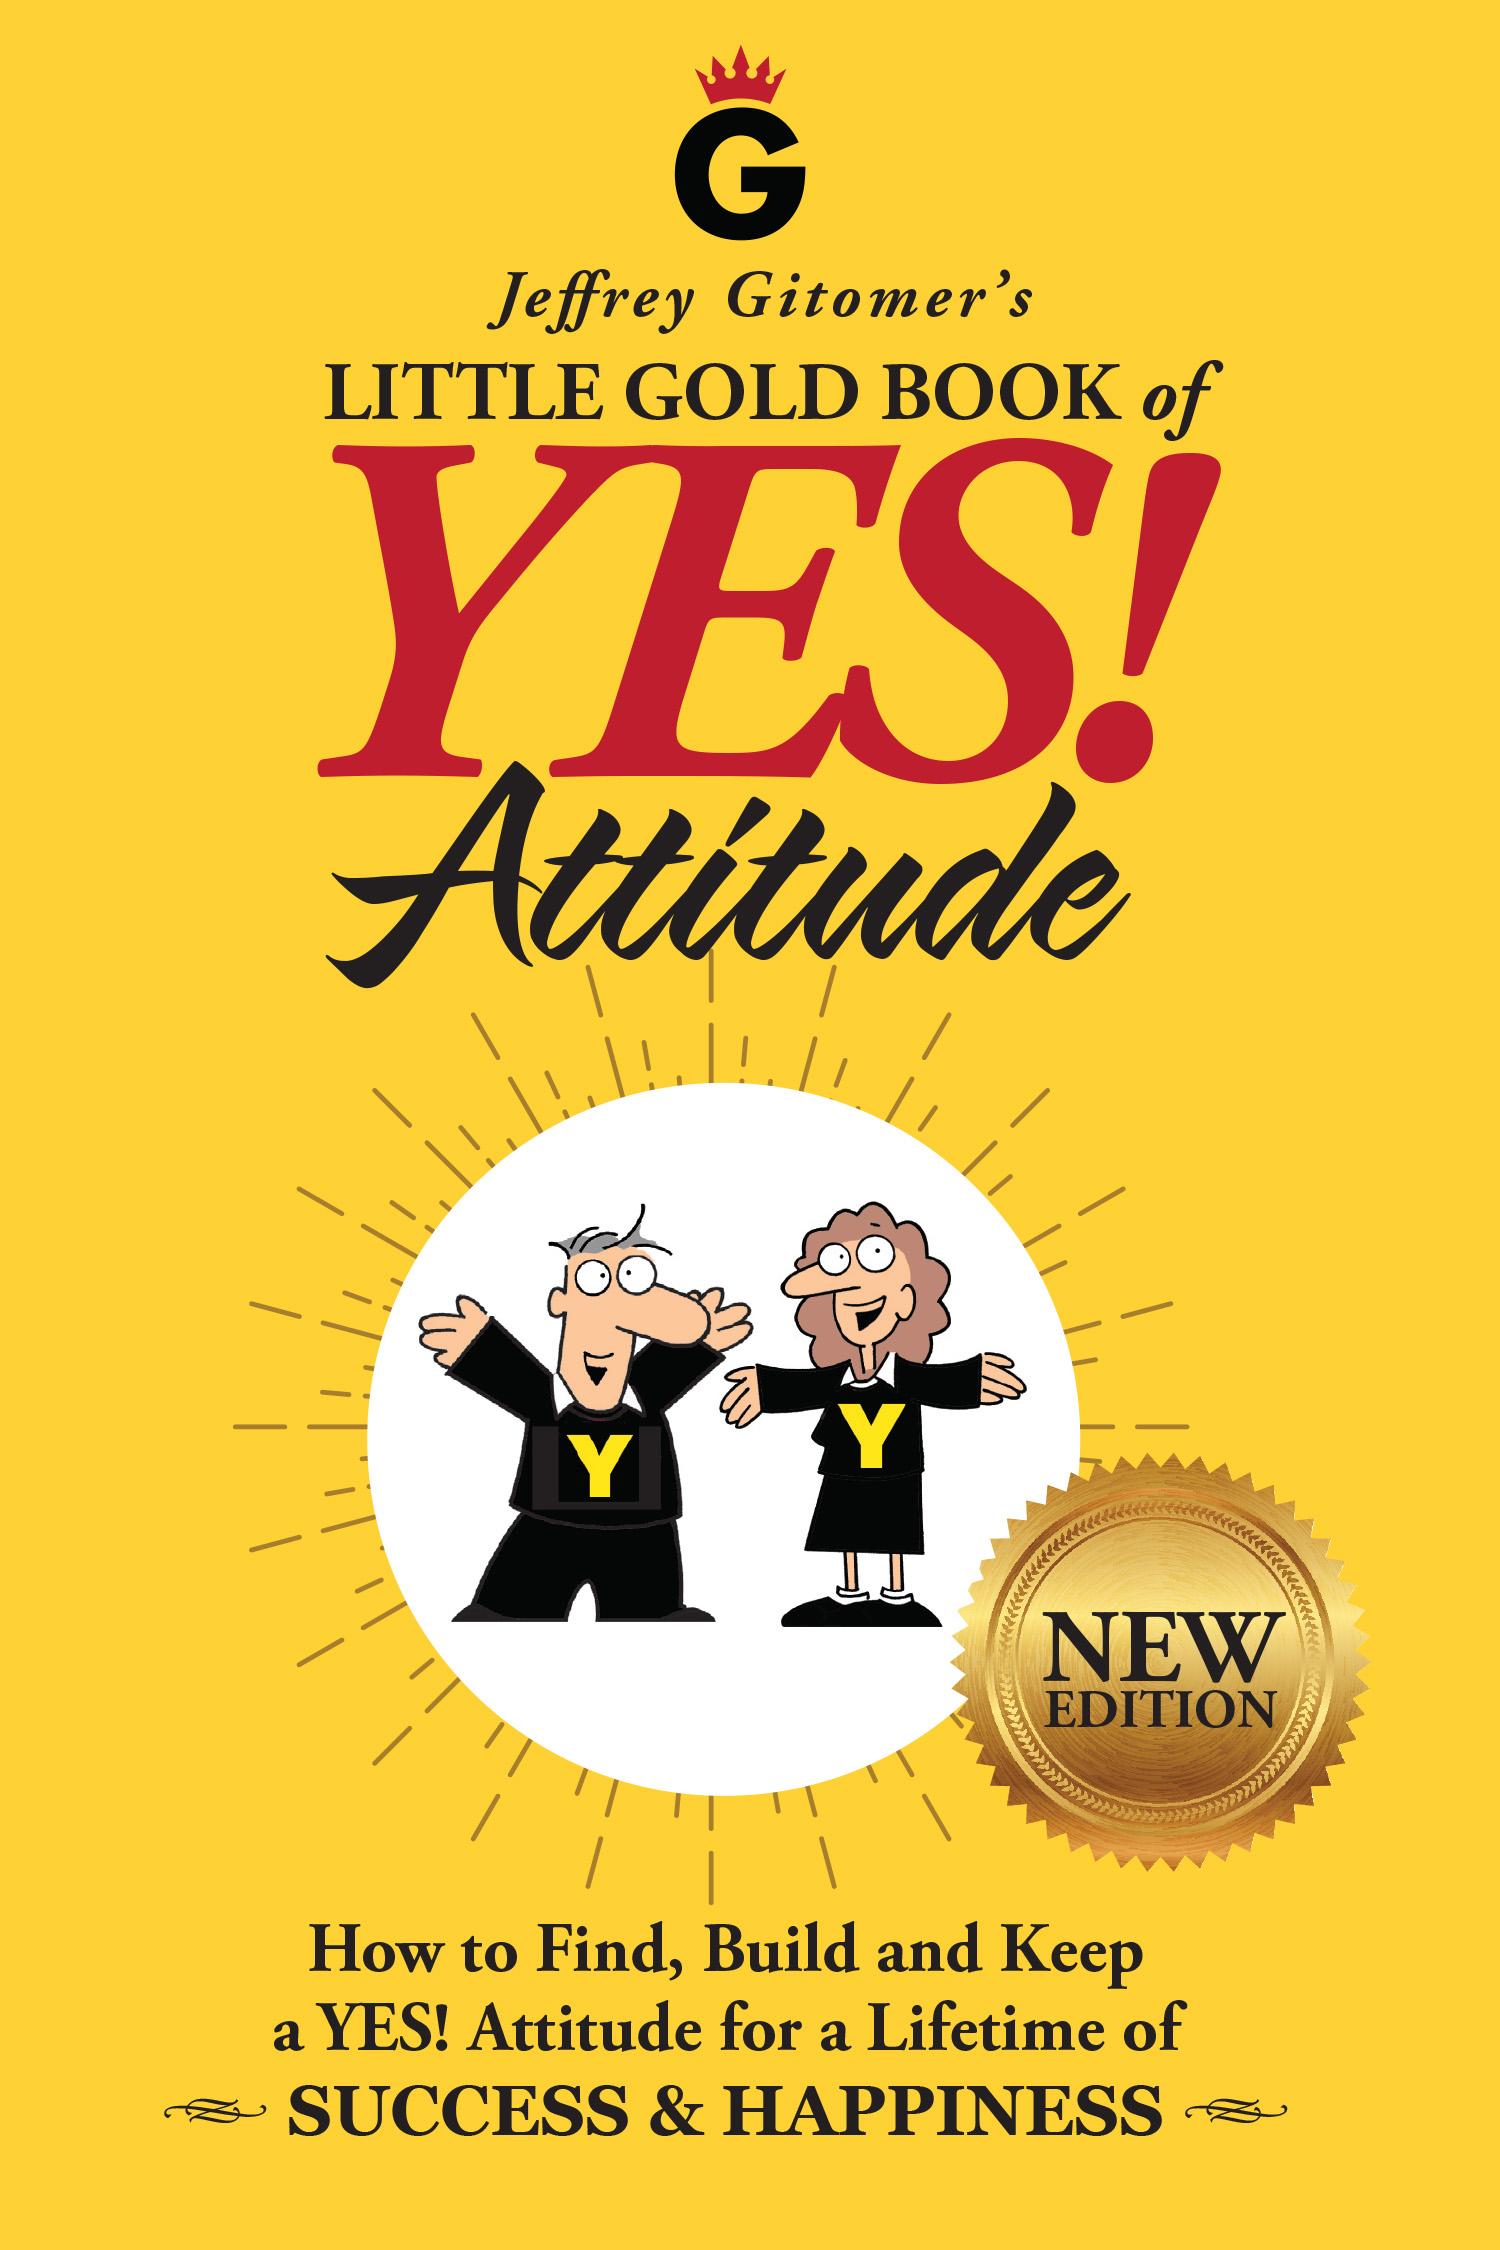 Jeffrey_Gitomer's_Little_Gold_Book_of_YES_Attitude.jpg